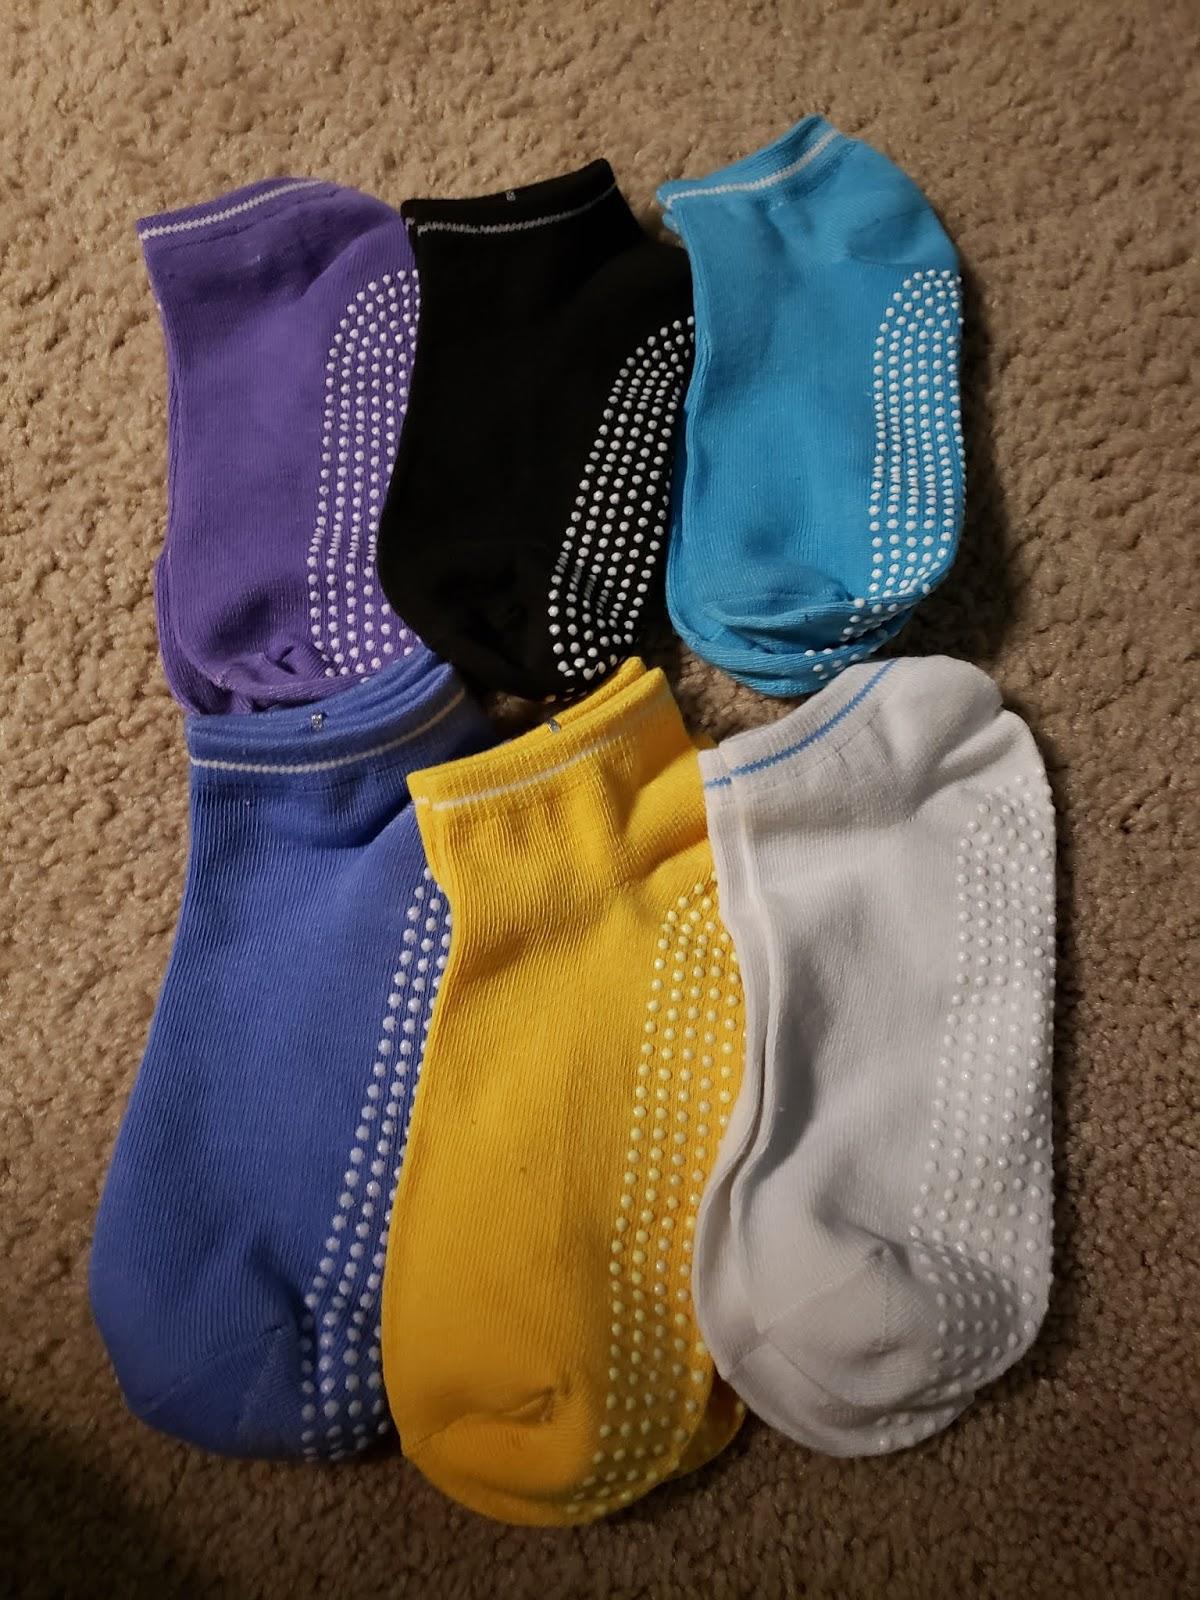 My Yoga Socks